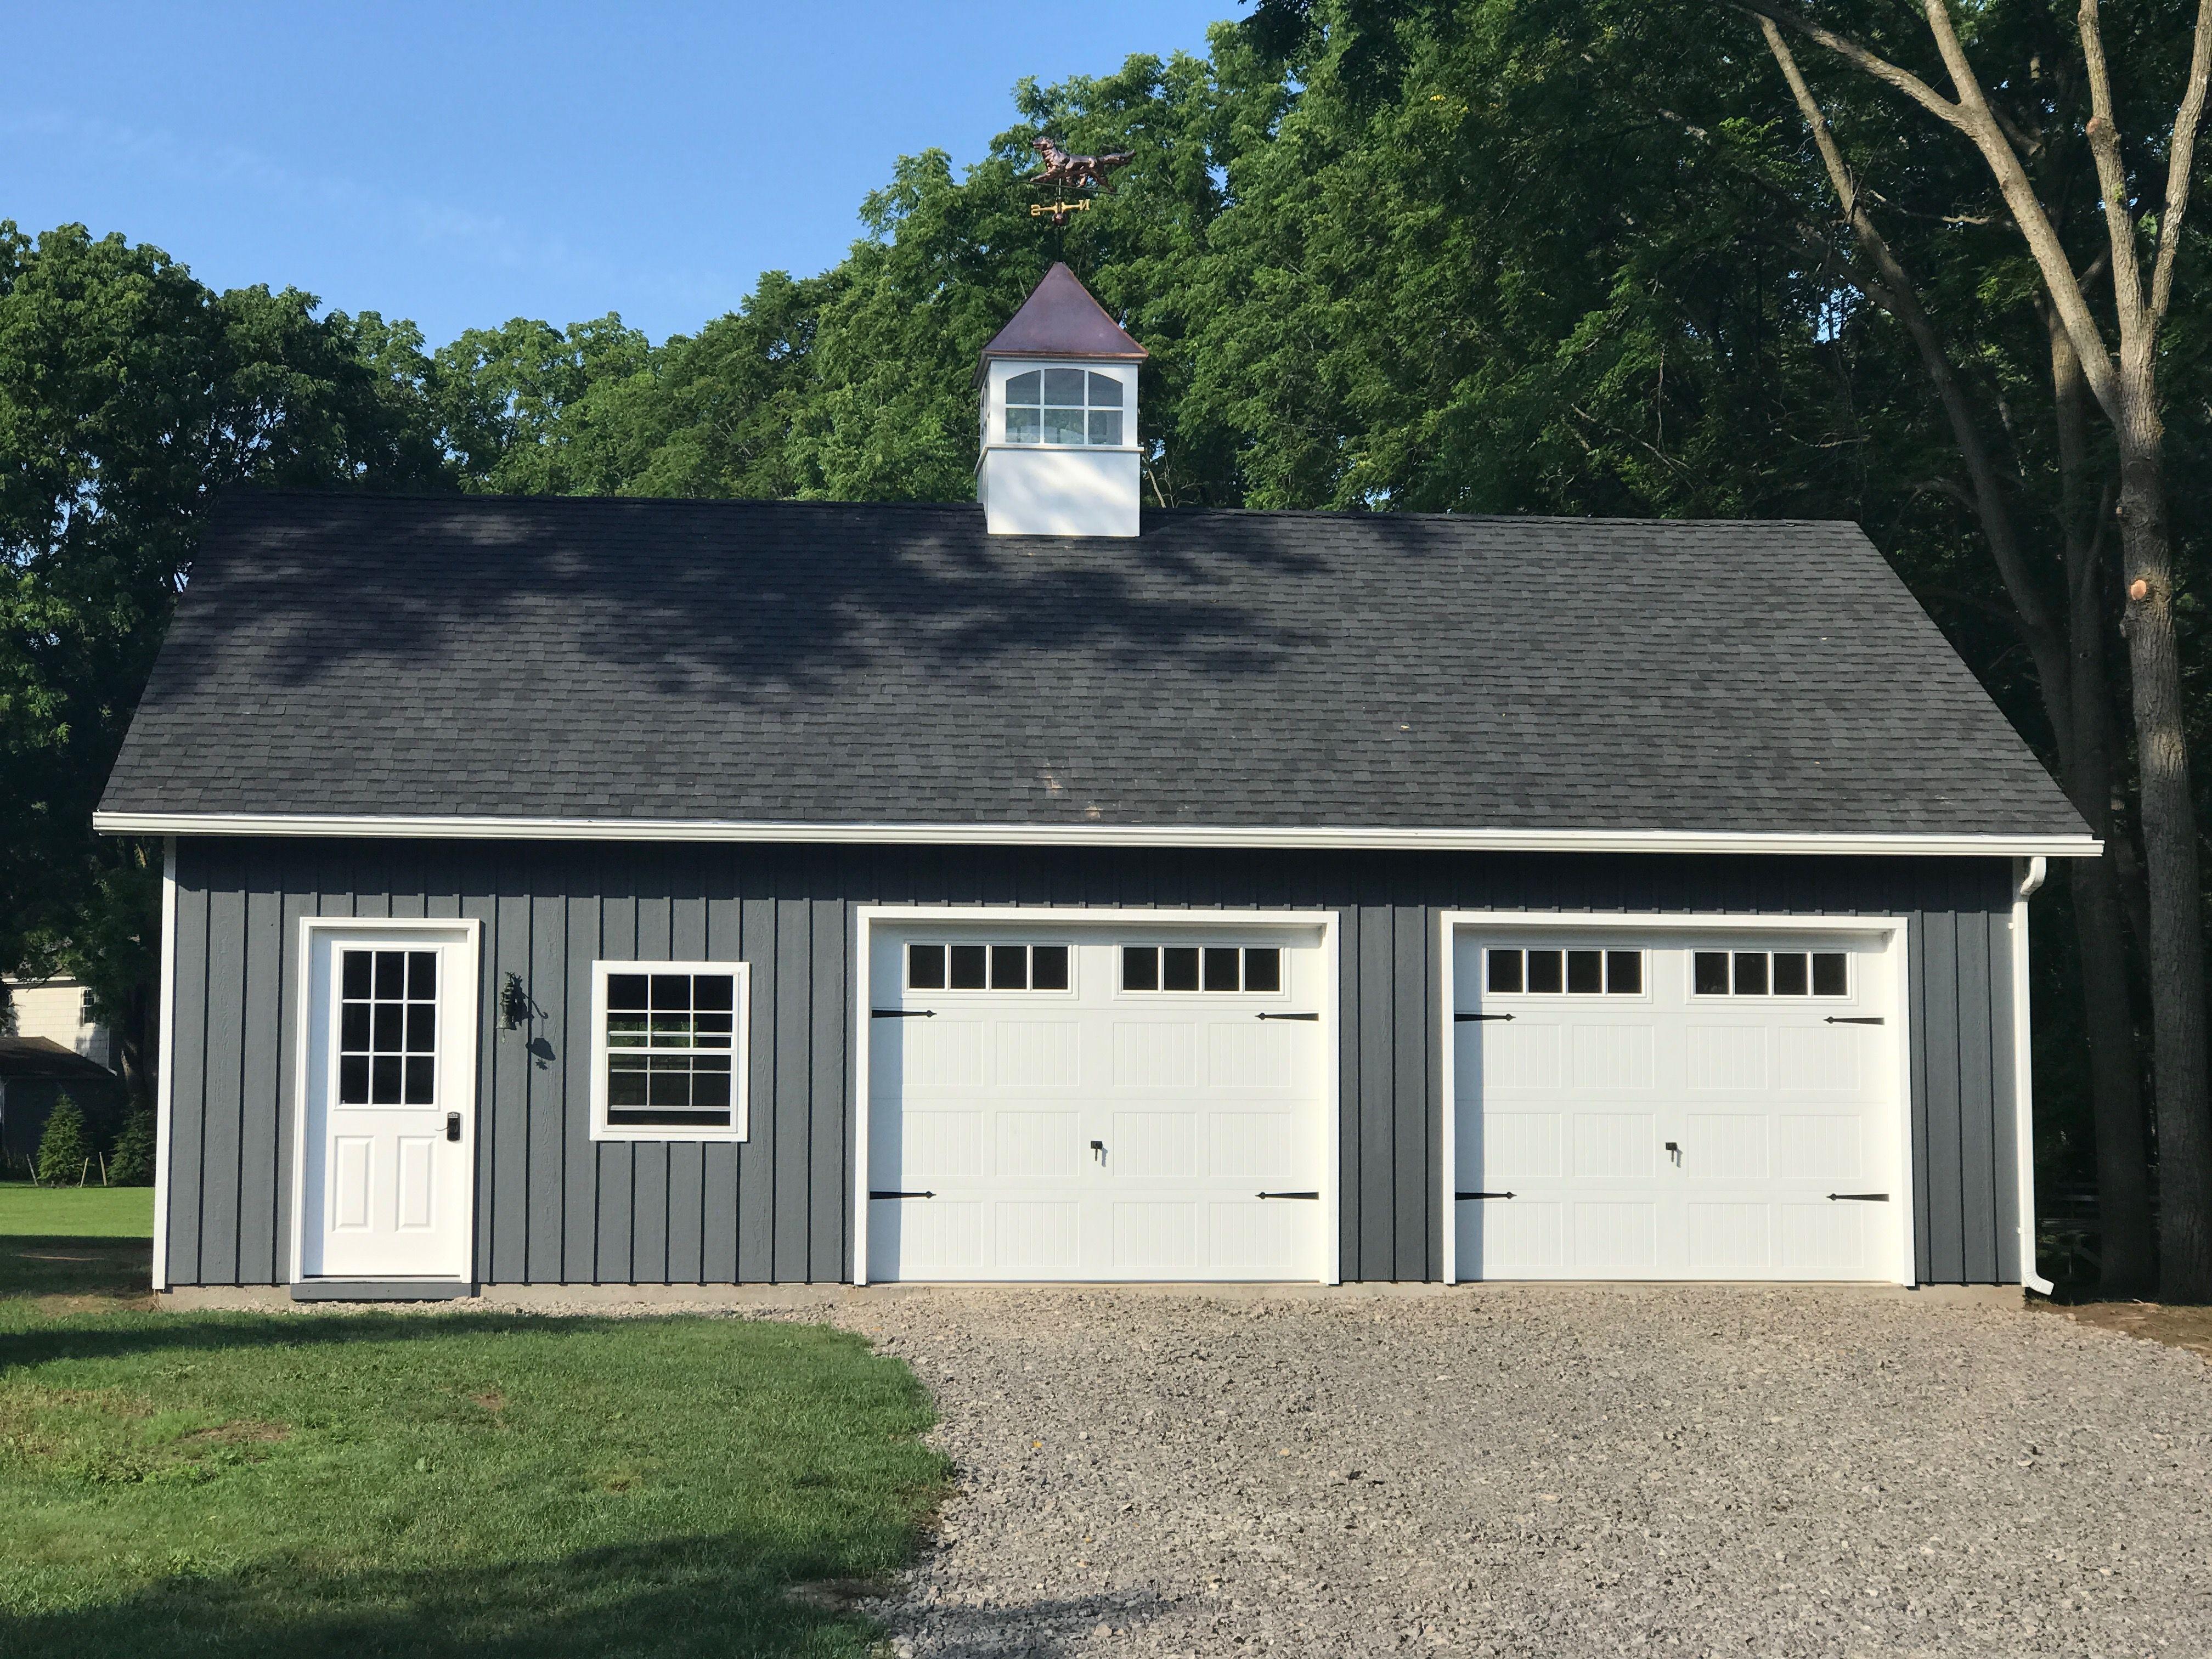 Prefab Garages & Modular Garage Builder | Woodtex.com Website